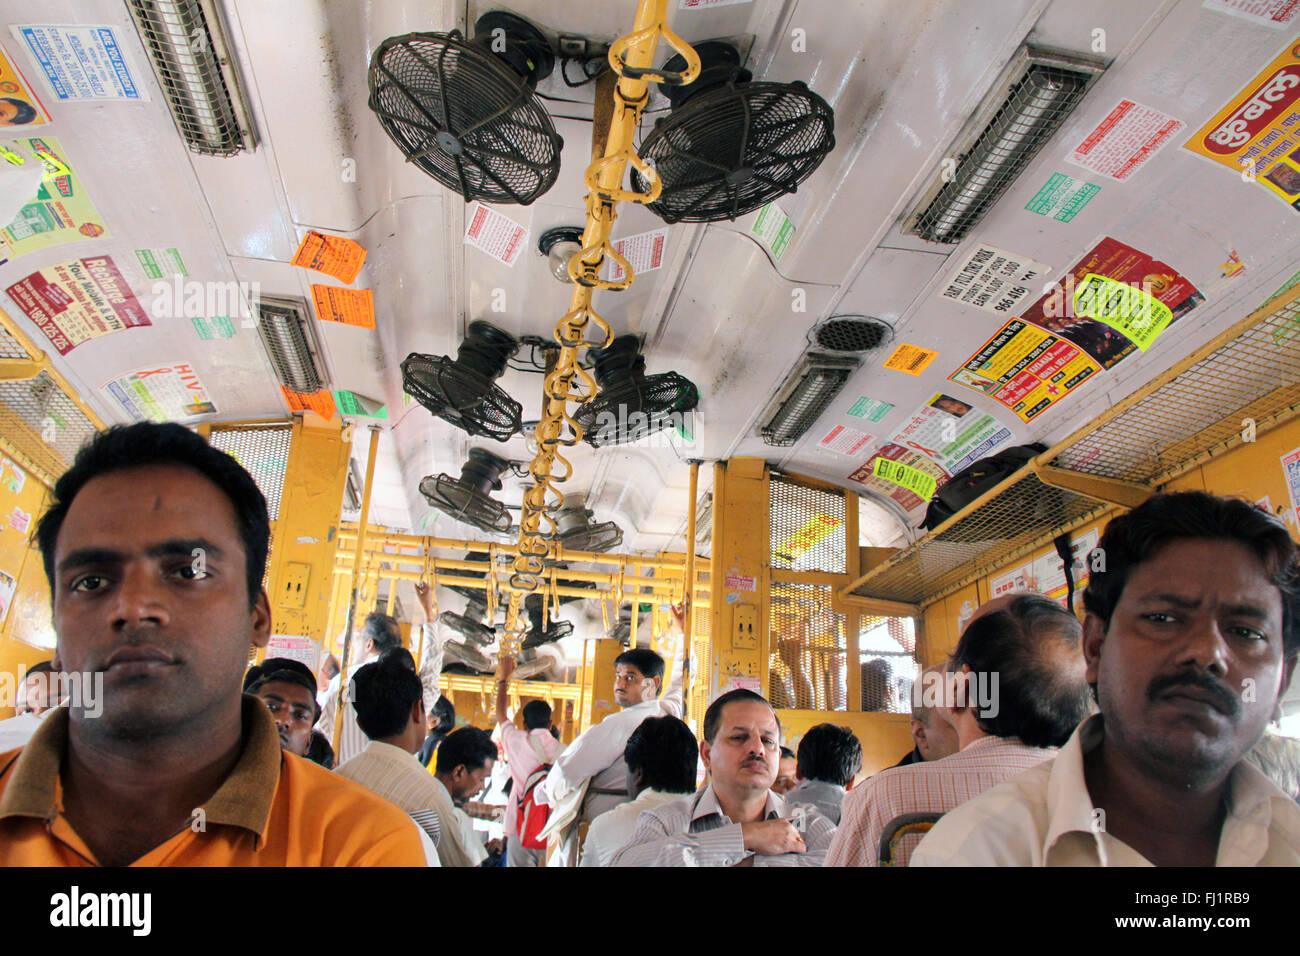 People passengers inside suburban train in Mumbai Bombay, India Stock Photo